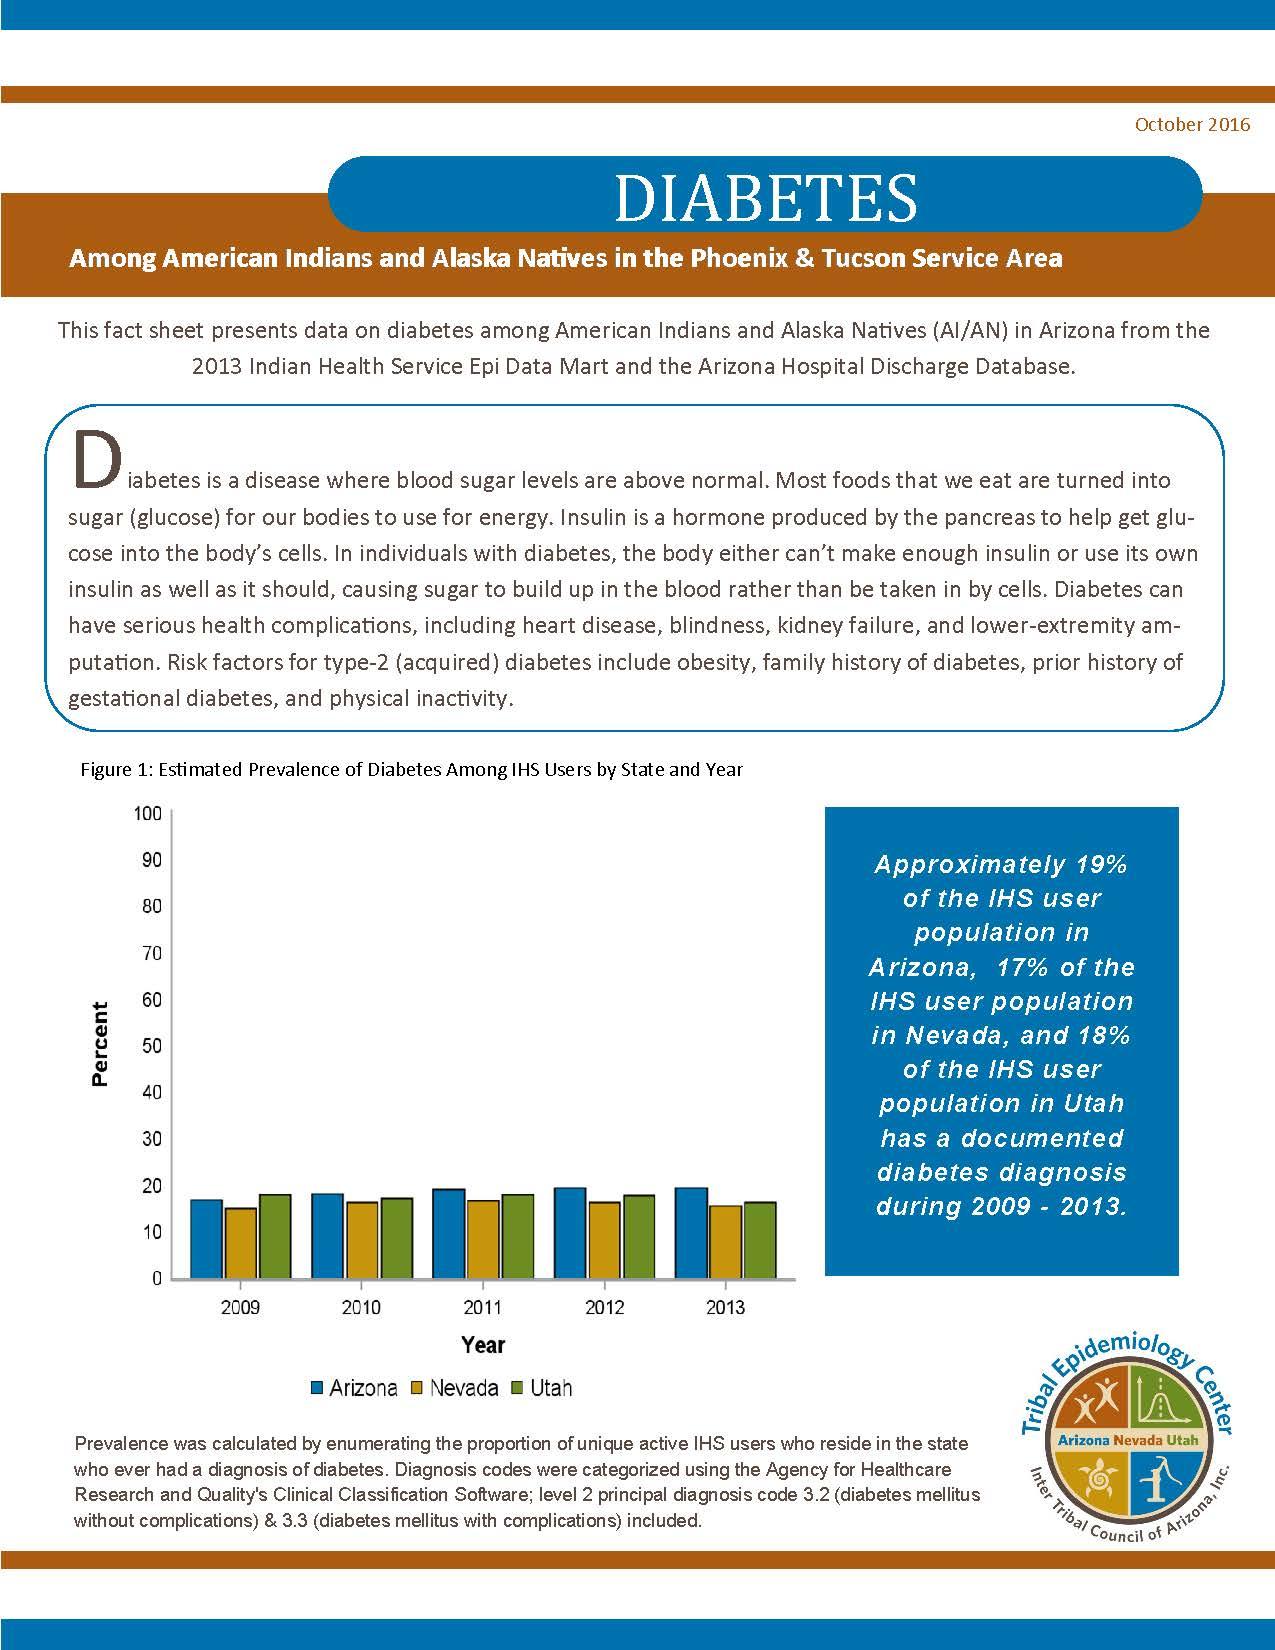 Diabetes_image